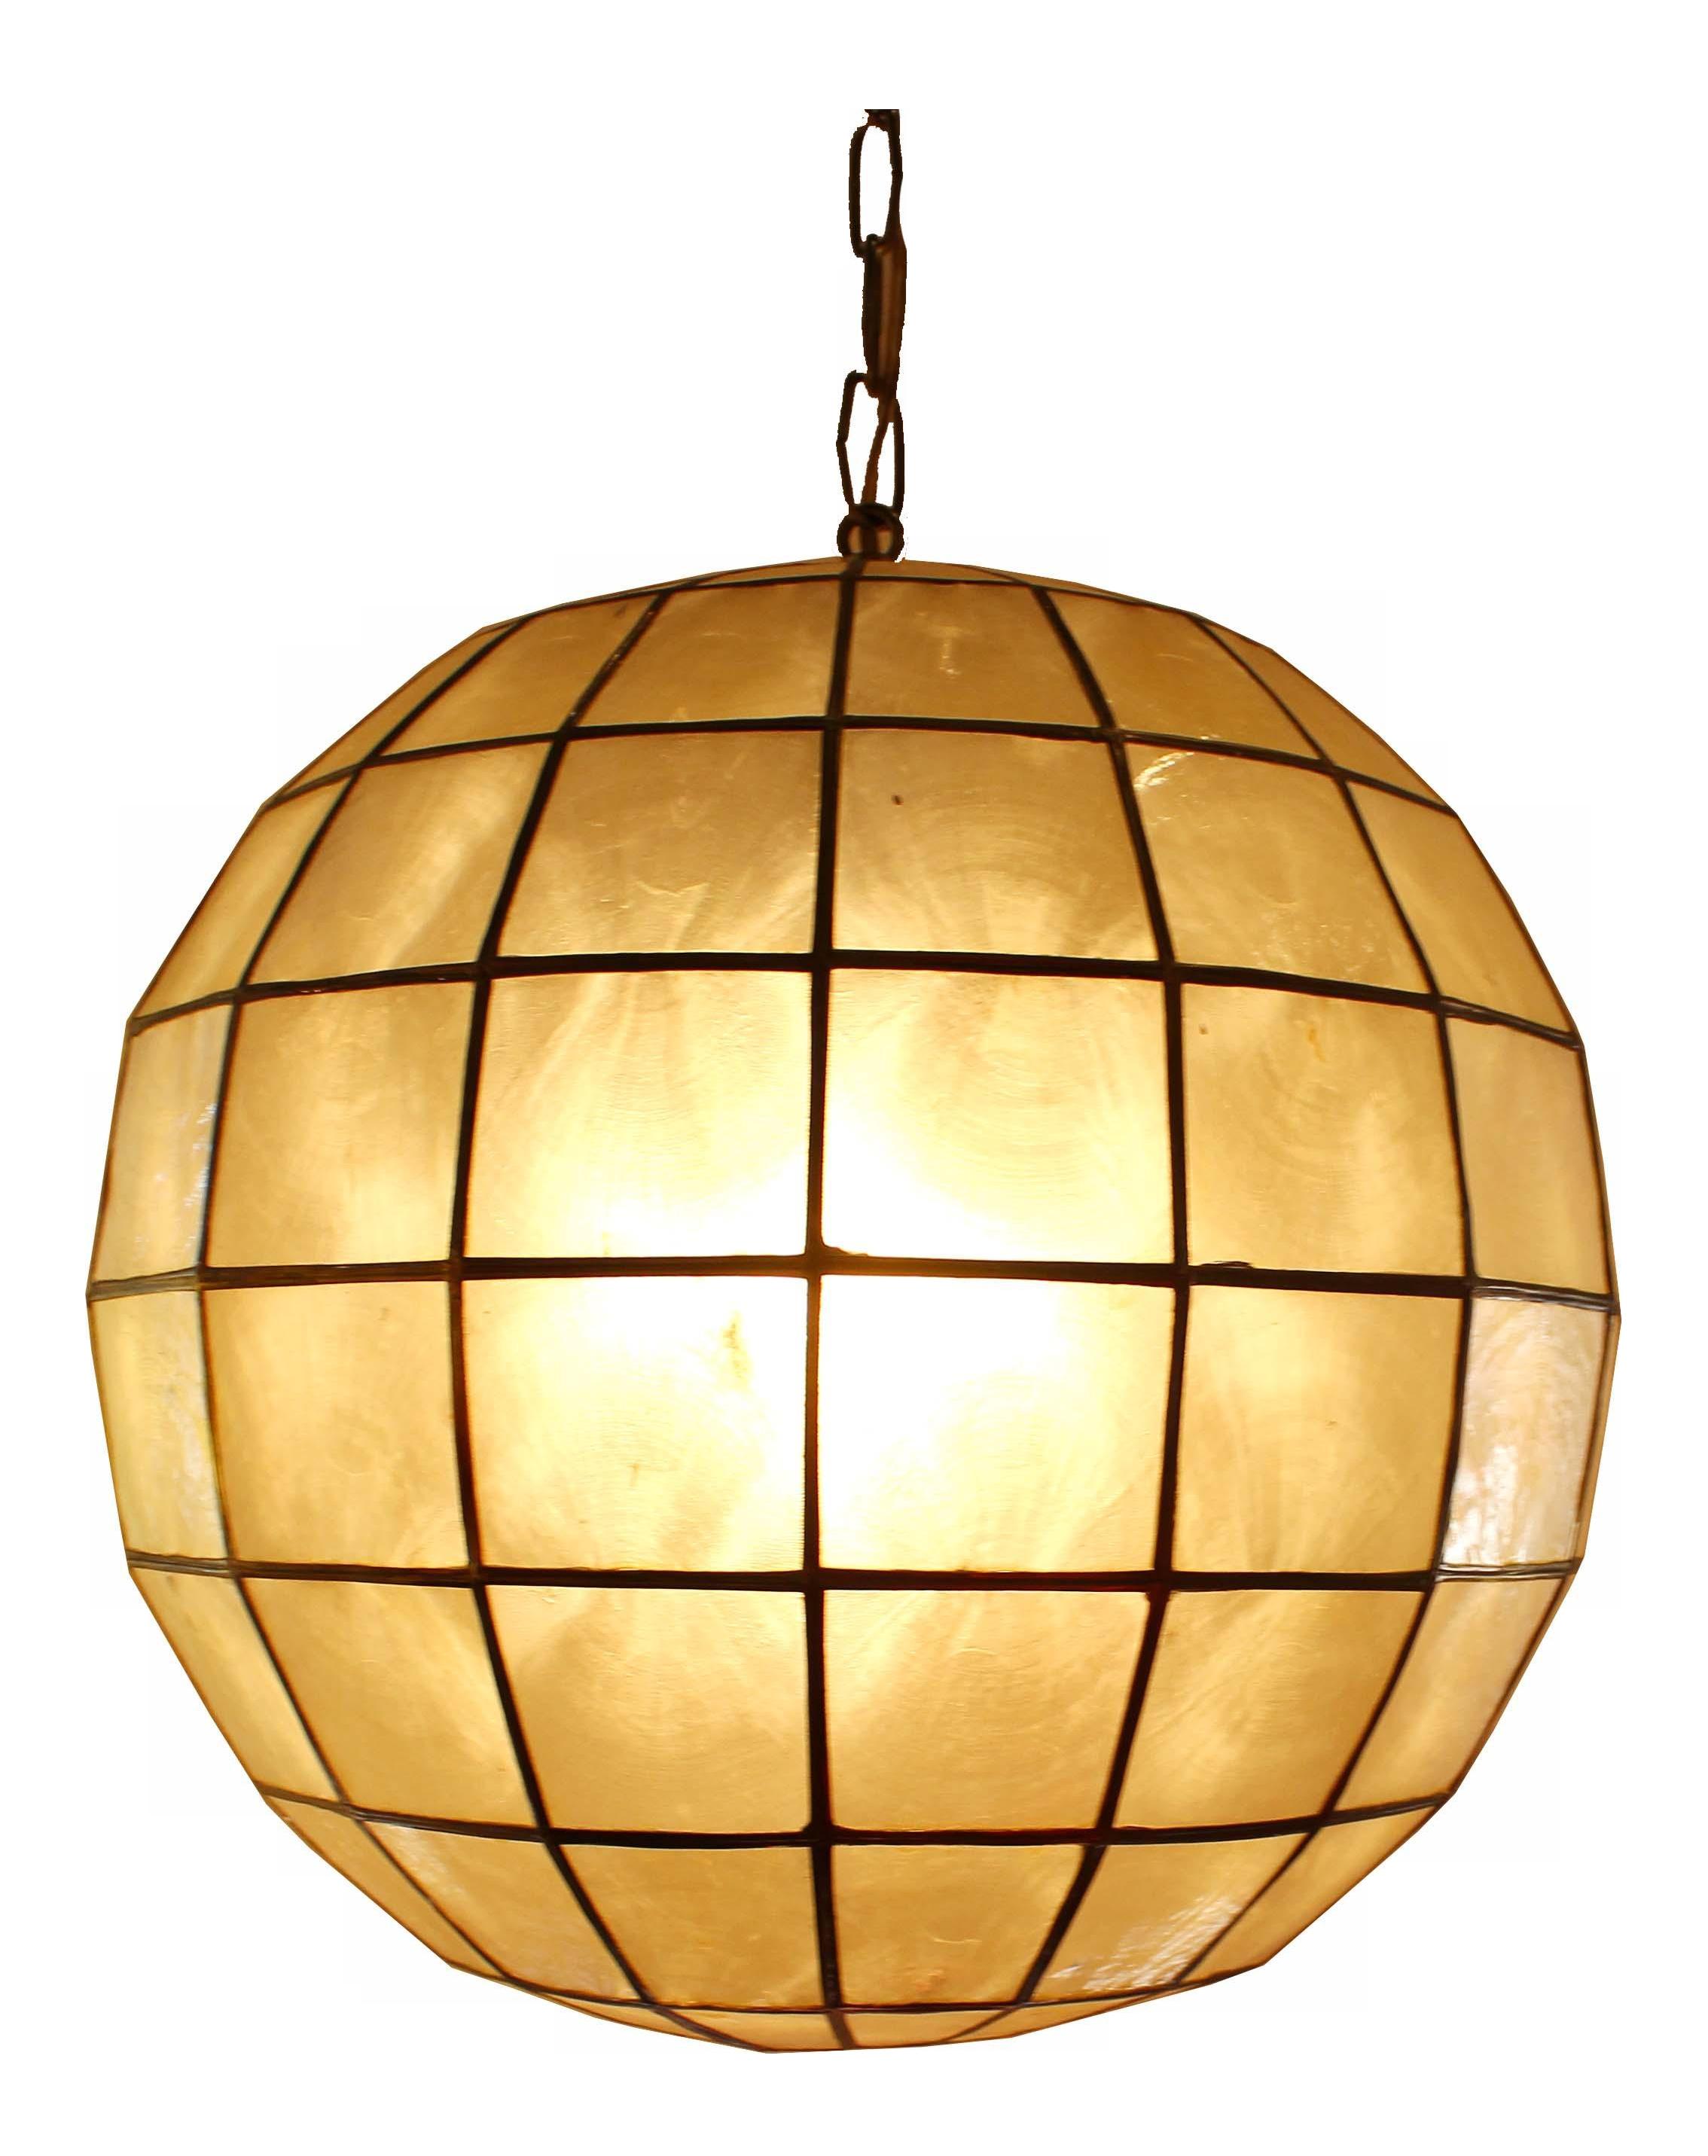 capiz shell globe pendant light chairish. Black Bedroom Furniture Sets. Home Design Ideas